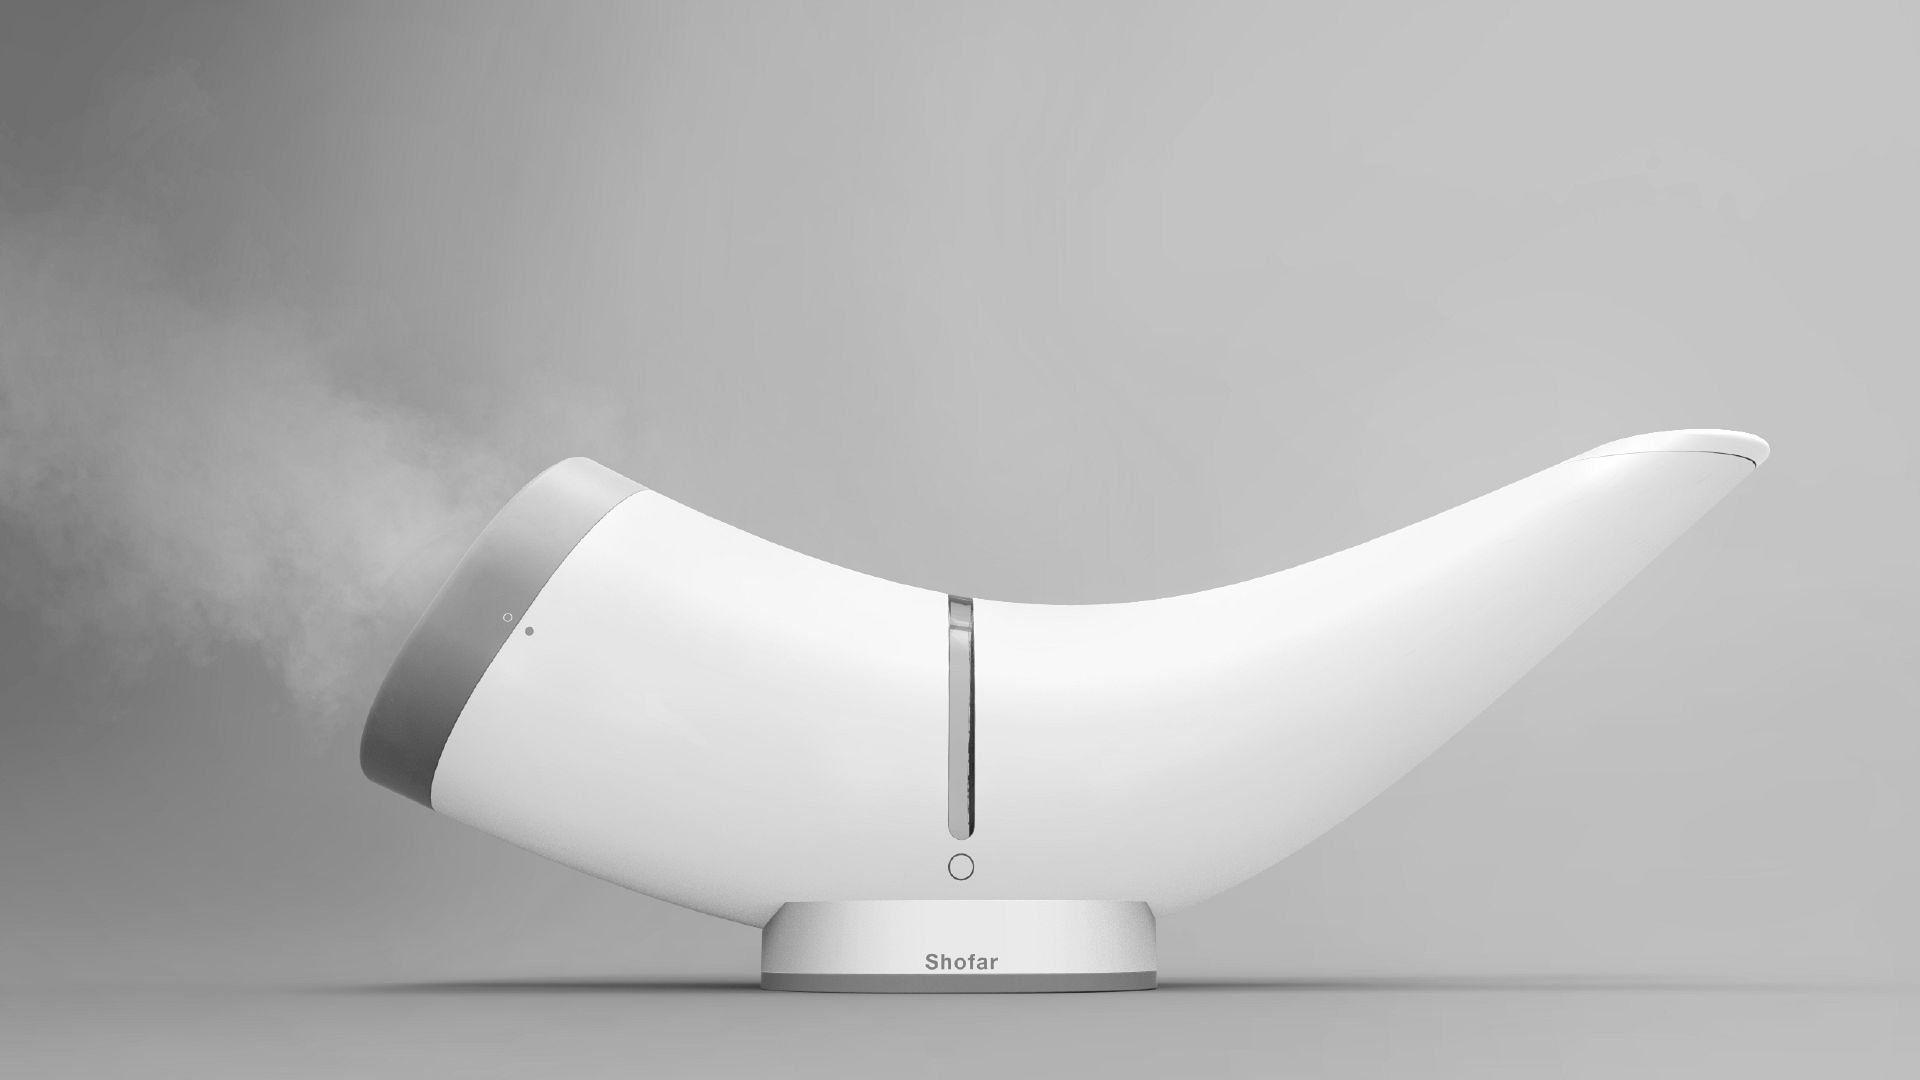 bc0da1cb8133ef35ed163072a5e991be Meilleur De De Parasol Design Concept